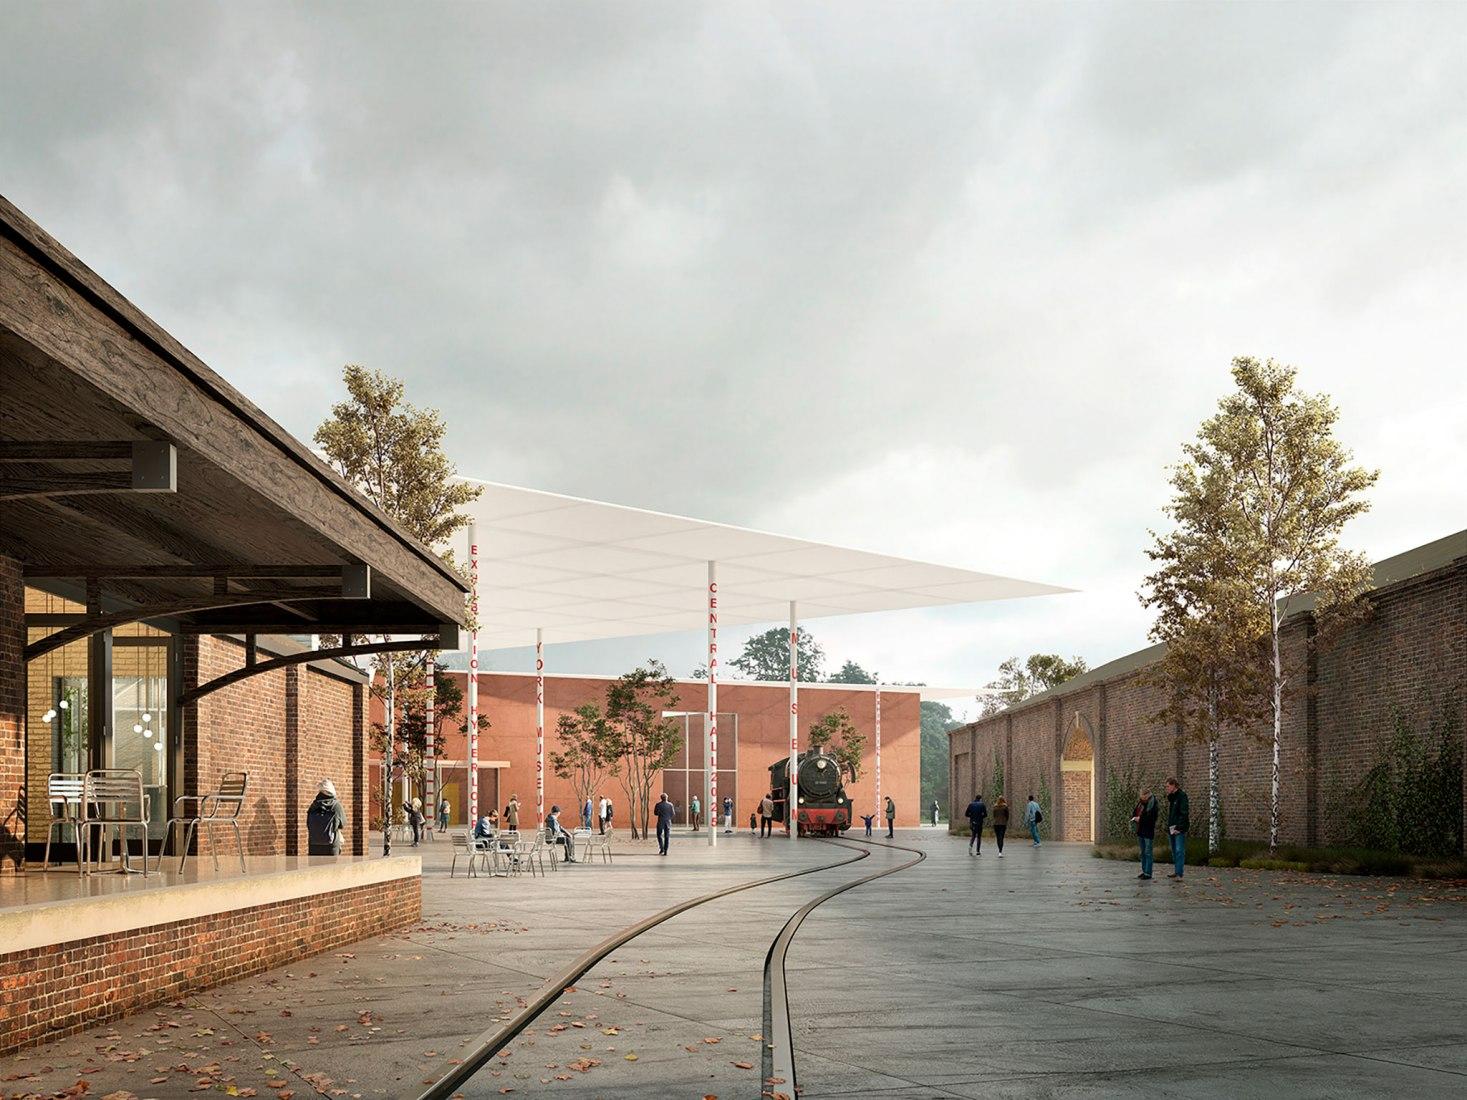 6a arquitectos (Reino Unido) y OFICINA Kersten Geers David Van Severen (Bélgica). Imagen © Malcolm Reading Consultants, 6a arquitectos, OFICINA Kersten Geers David Van Severen.